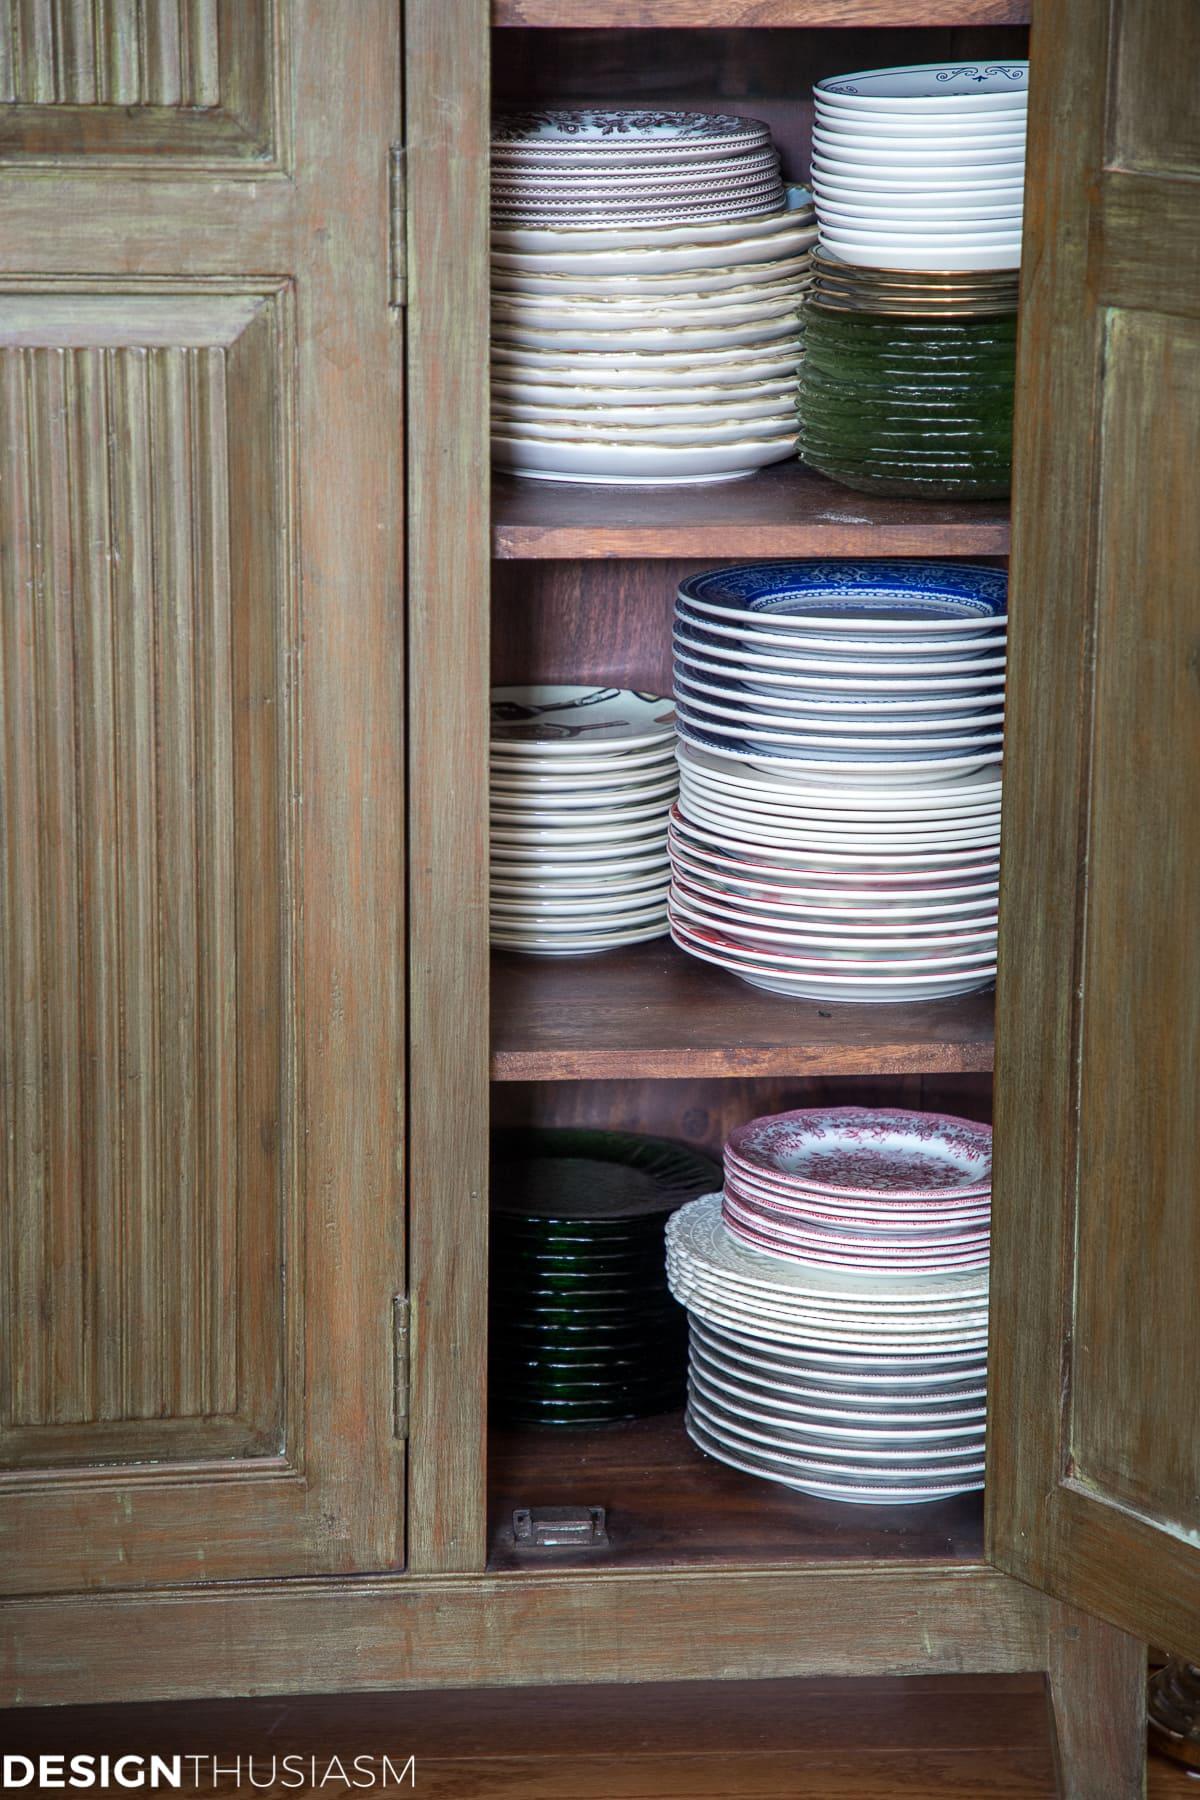 dish storage and organization ideas